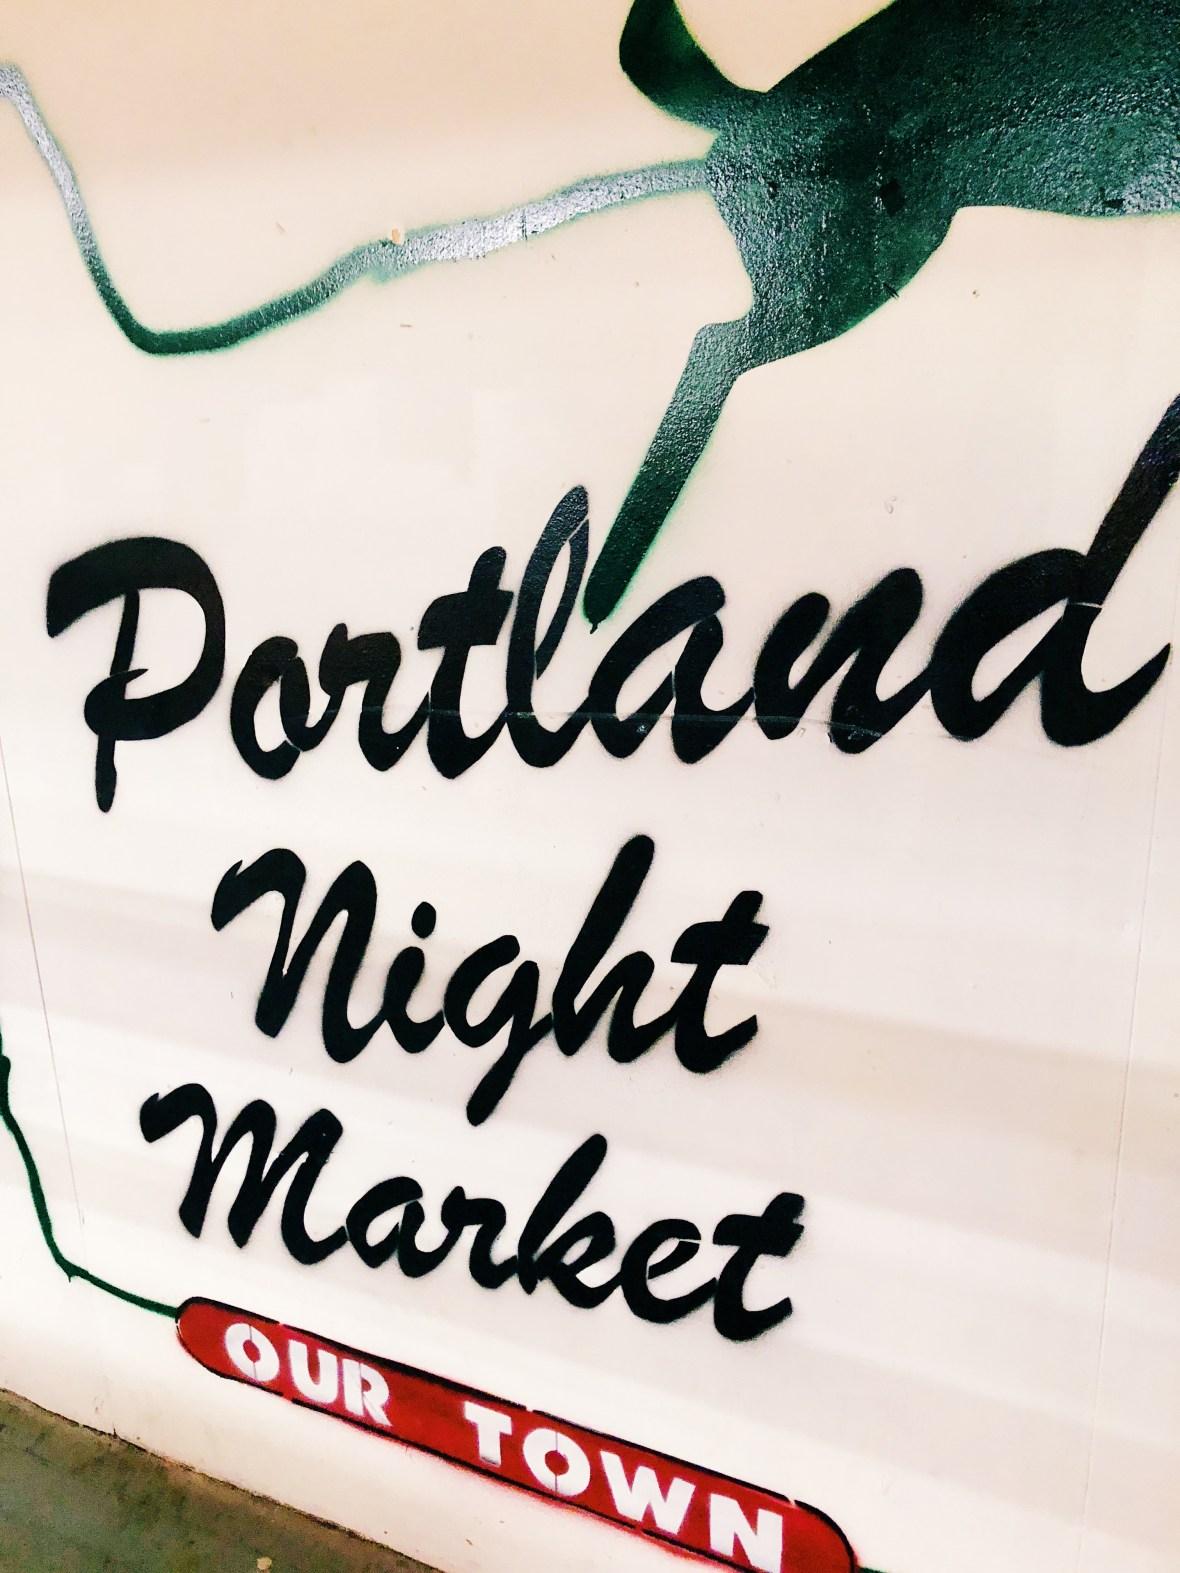 Portland Night Market // stephanieorefice.net